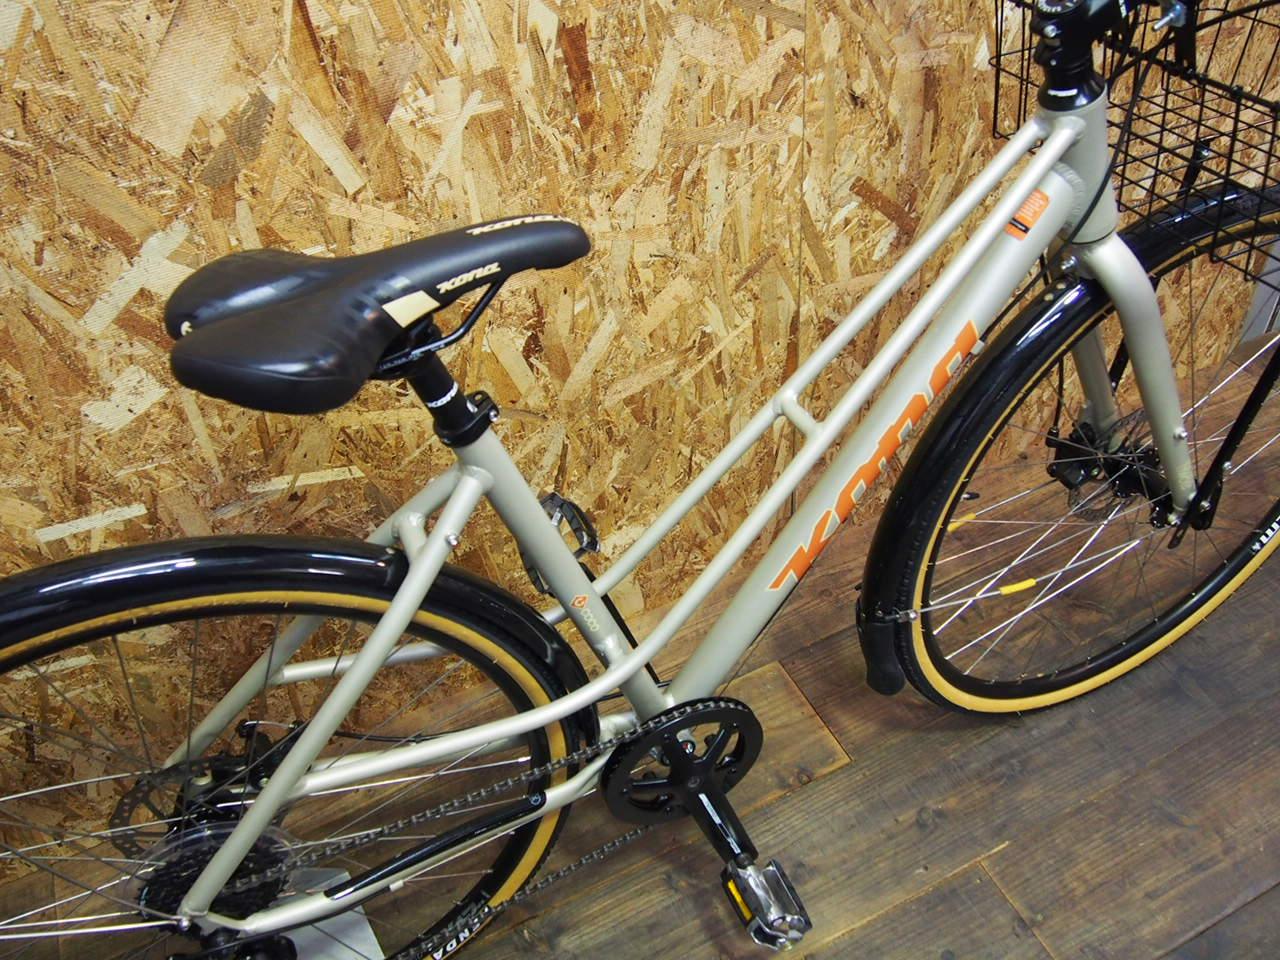 中古自転車 中古自転車 京都 : KONA COCO 2015 | 京都の中古自転車 ...